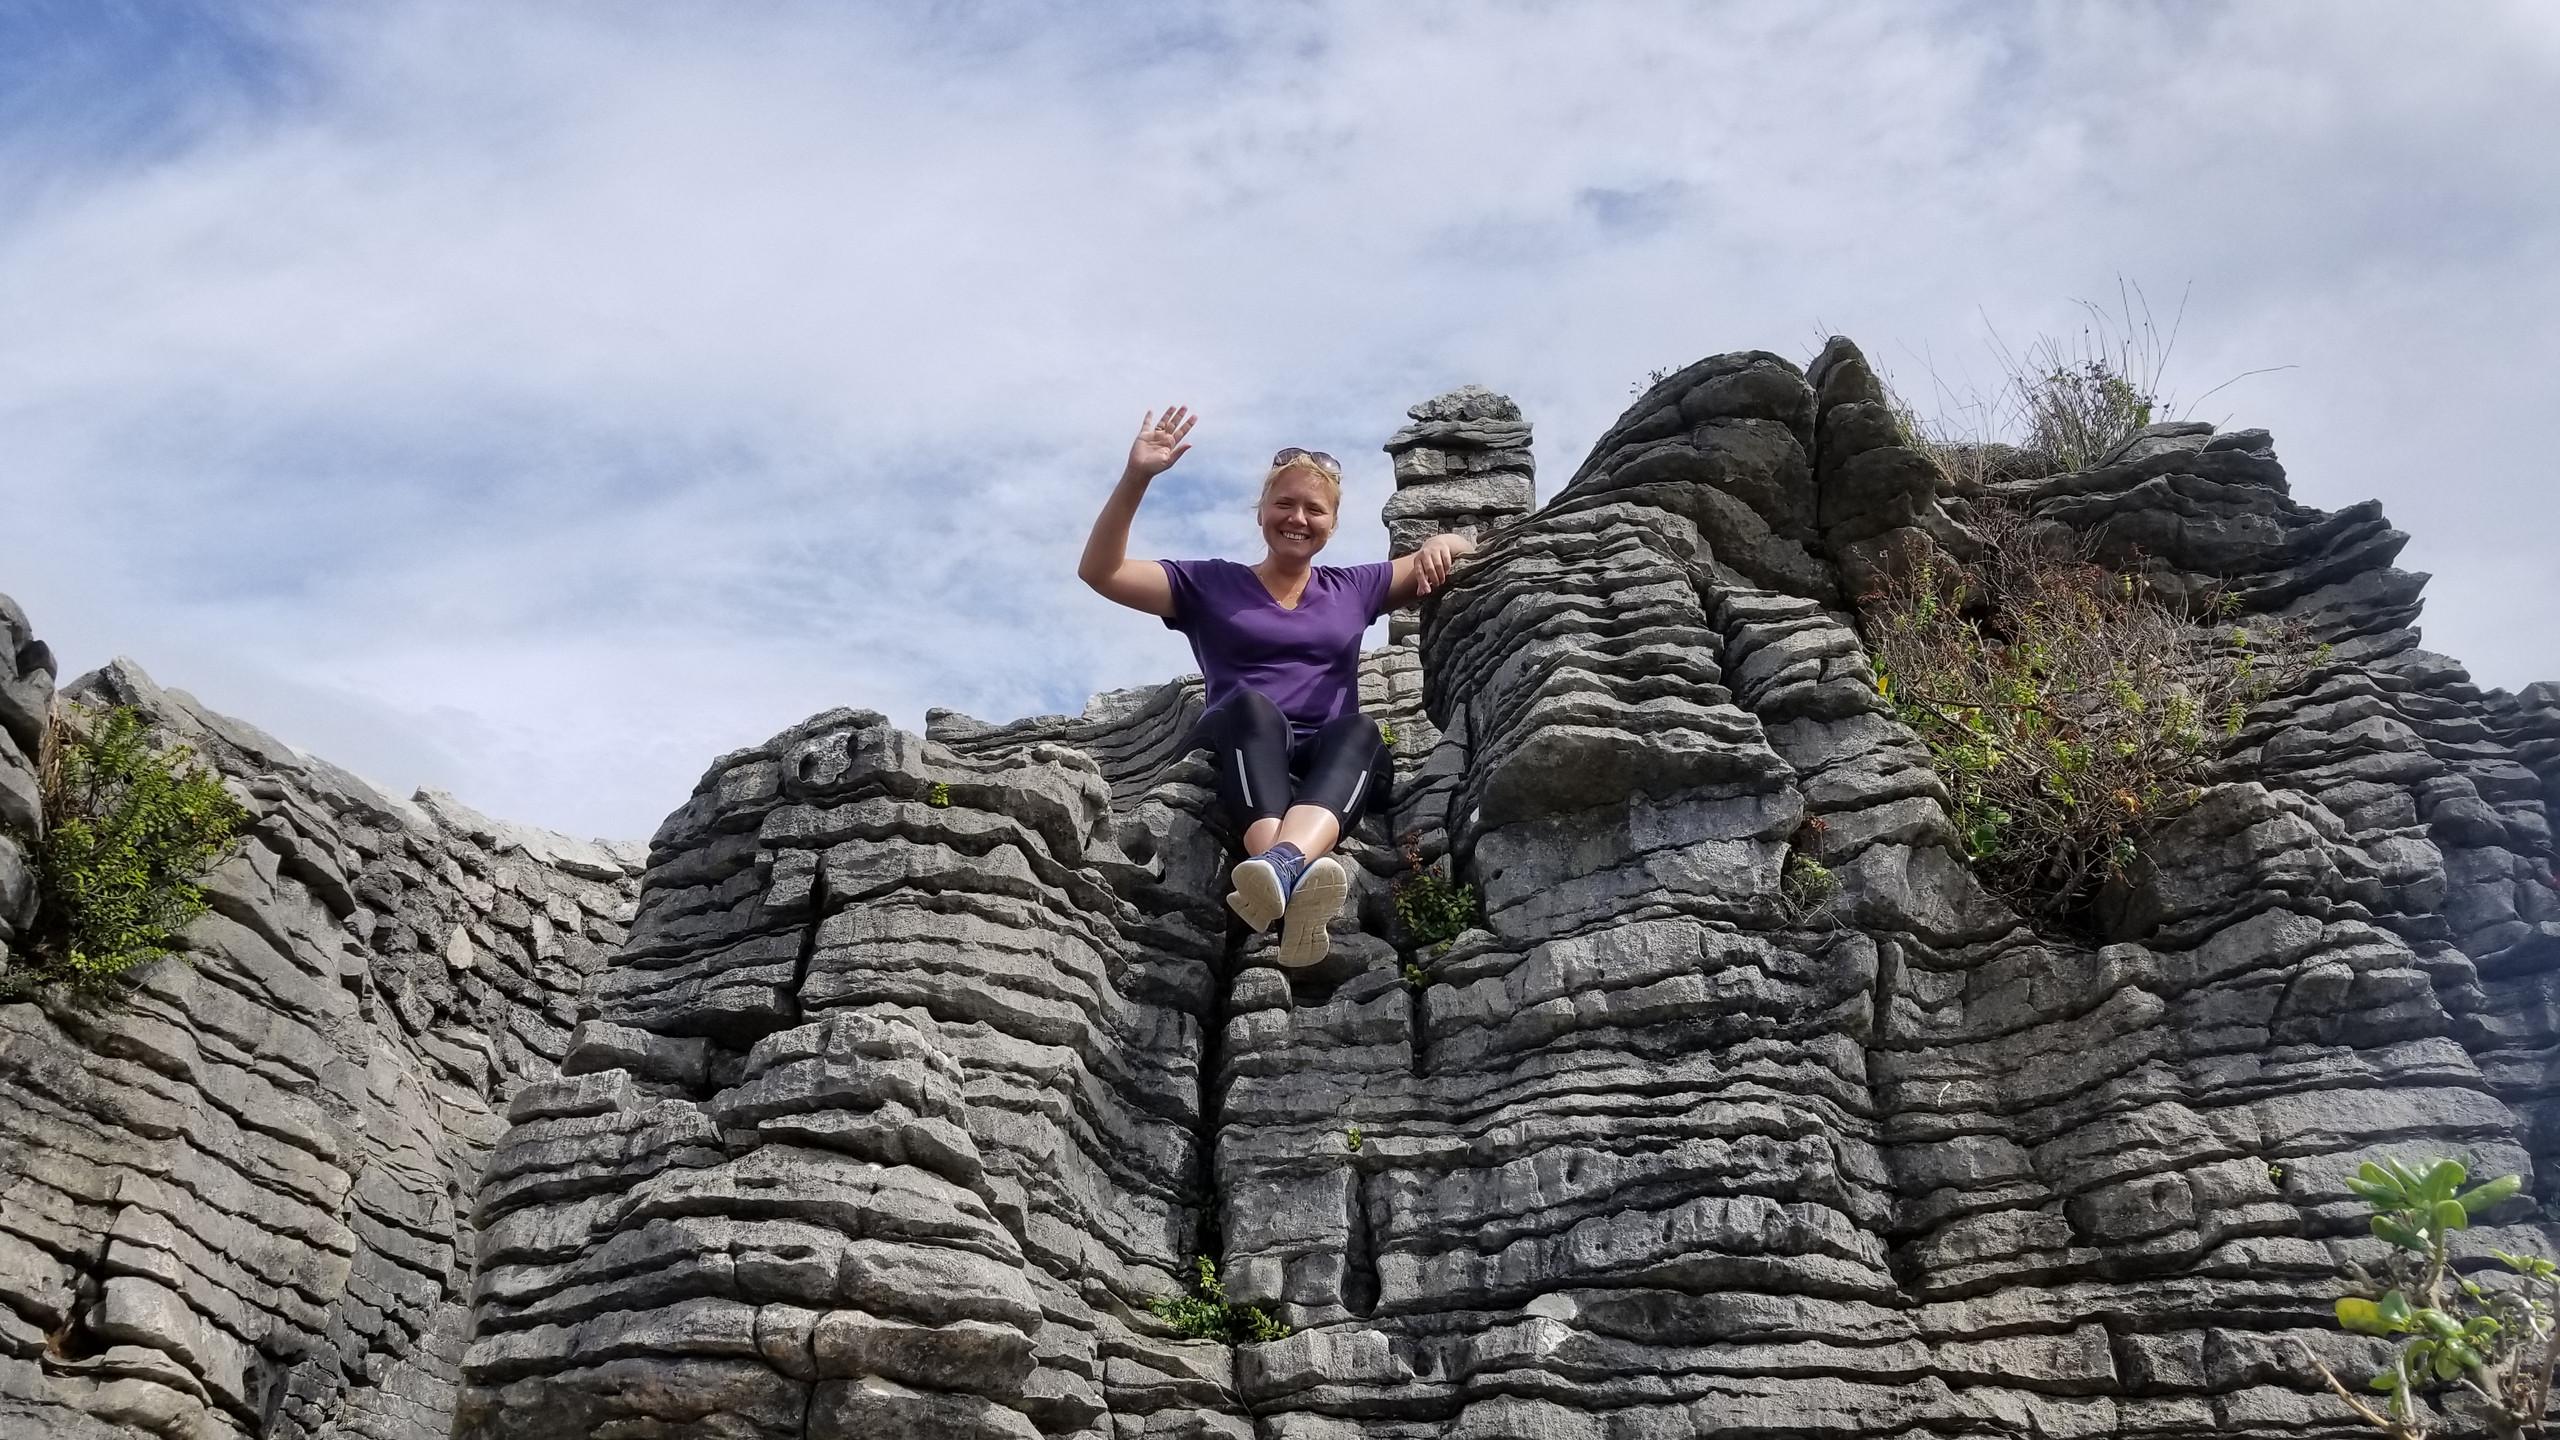 Punakaiki pancake rocks, New Zealand attractions, New Zealand activities